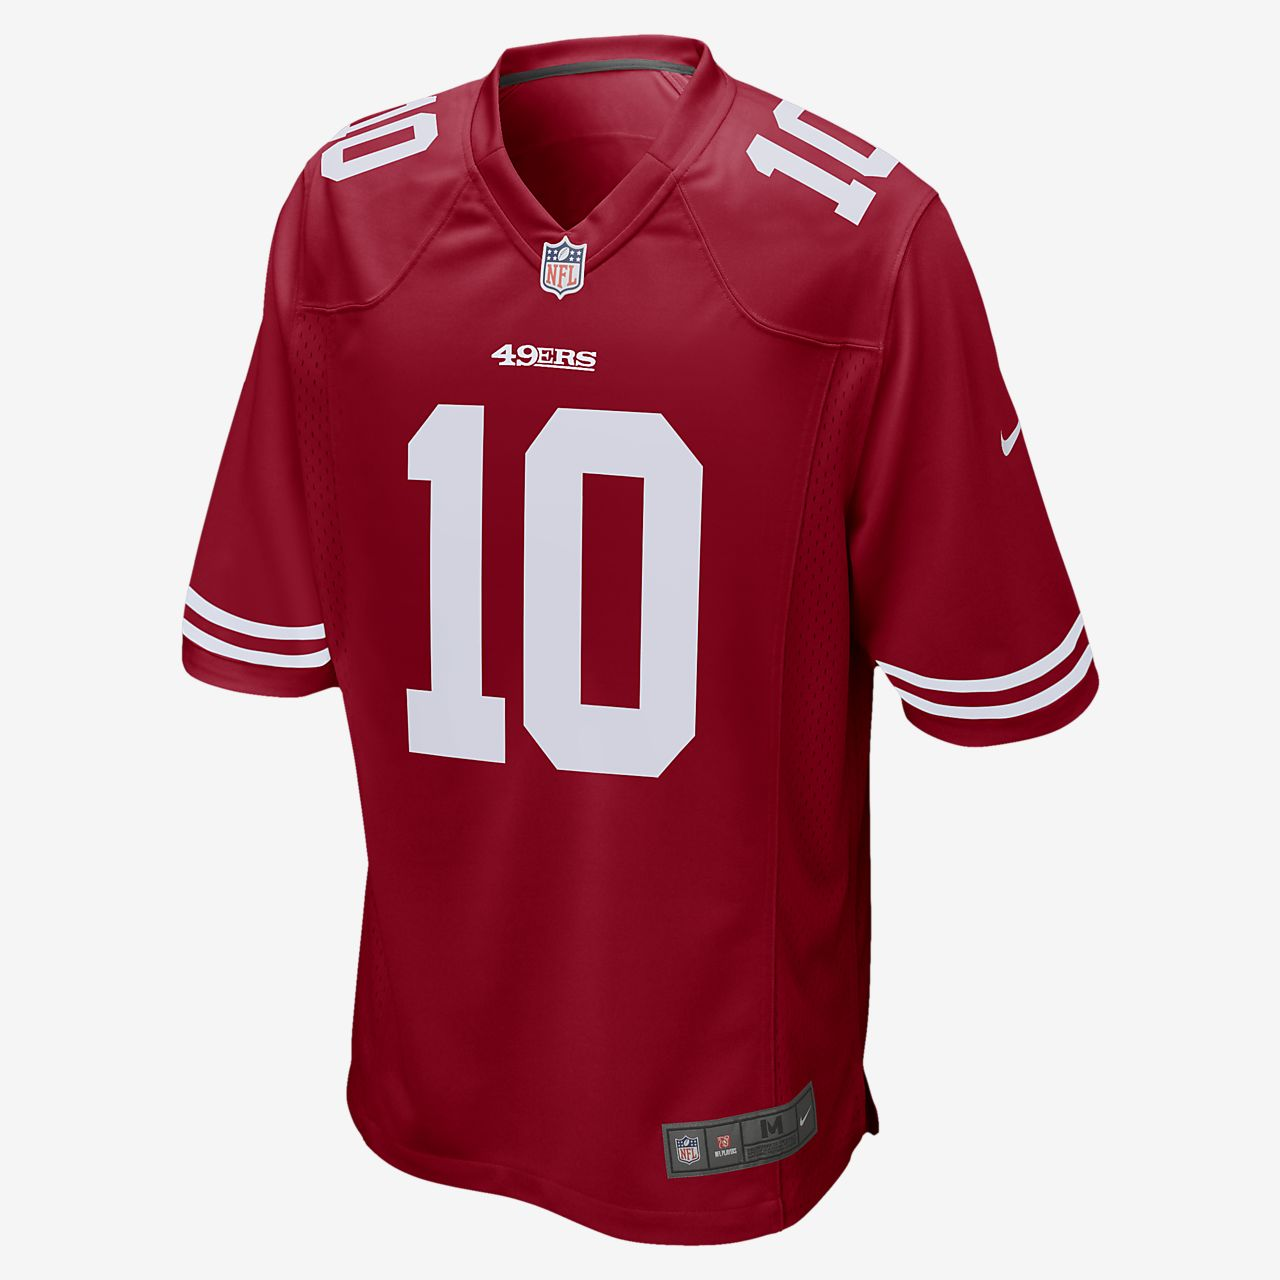 Maglia da football americano San Francisco 49ers (Jimmy Garoppolo) Game NFL - Uomo